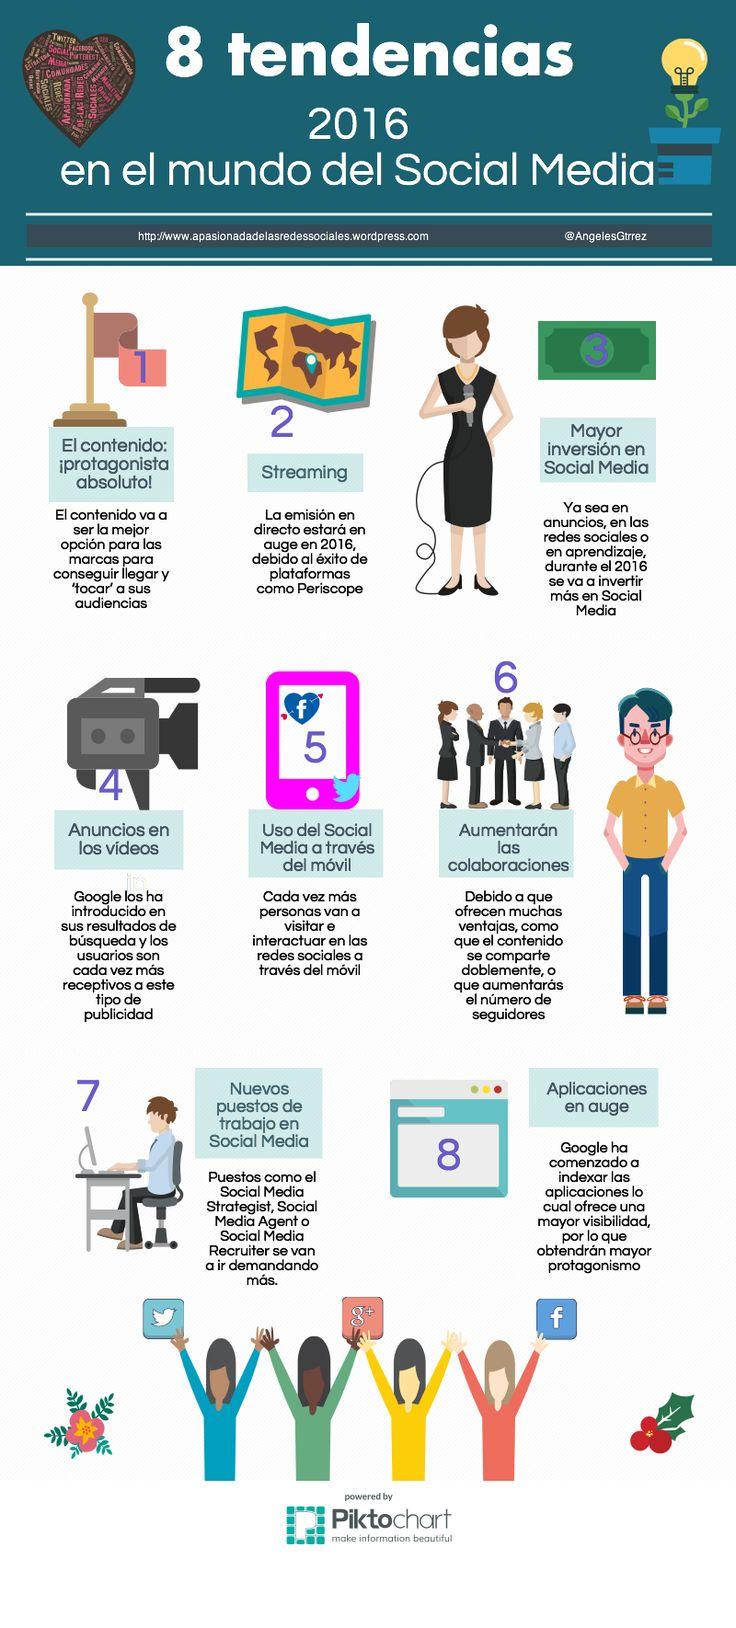 8 tendencias en Redes Sociales para 2016 #infografia #infographic #socialmedia                                                                                                                                                                                 Más